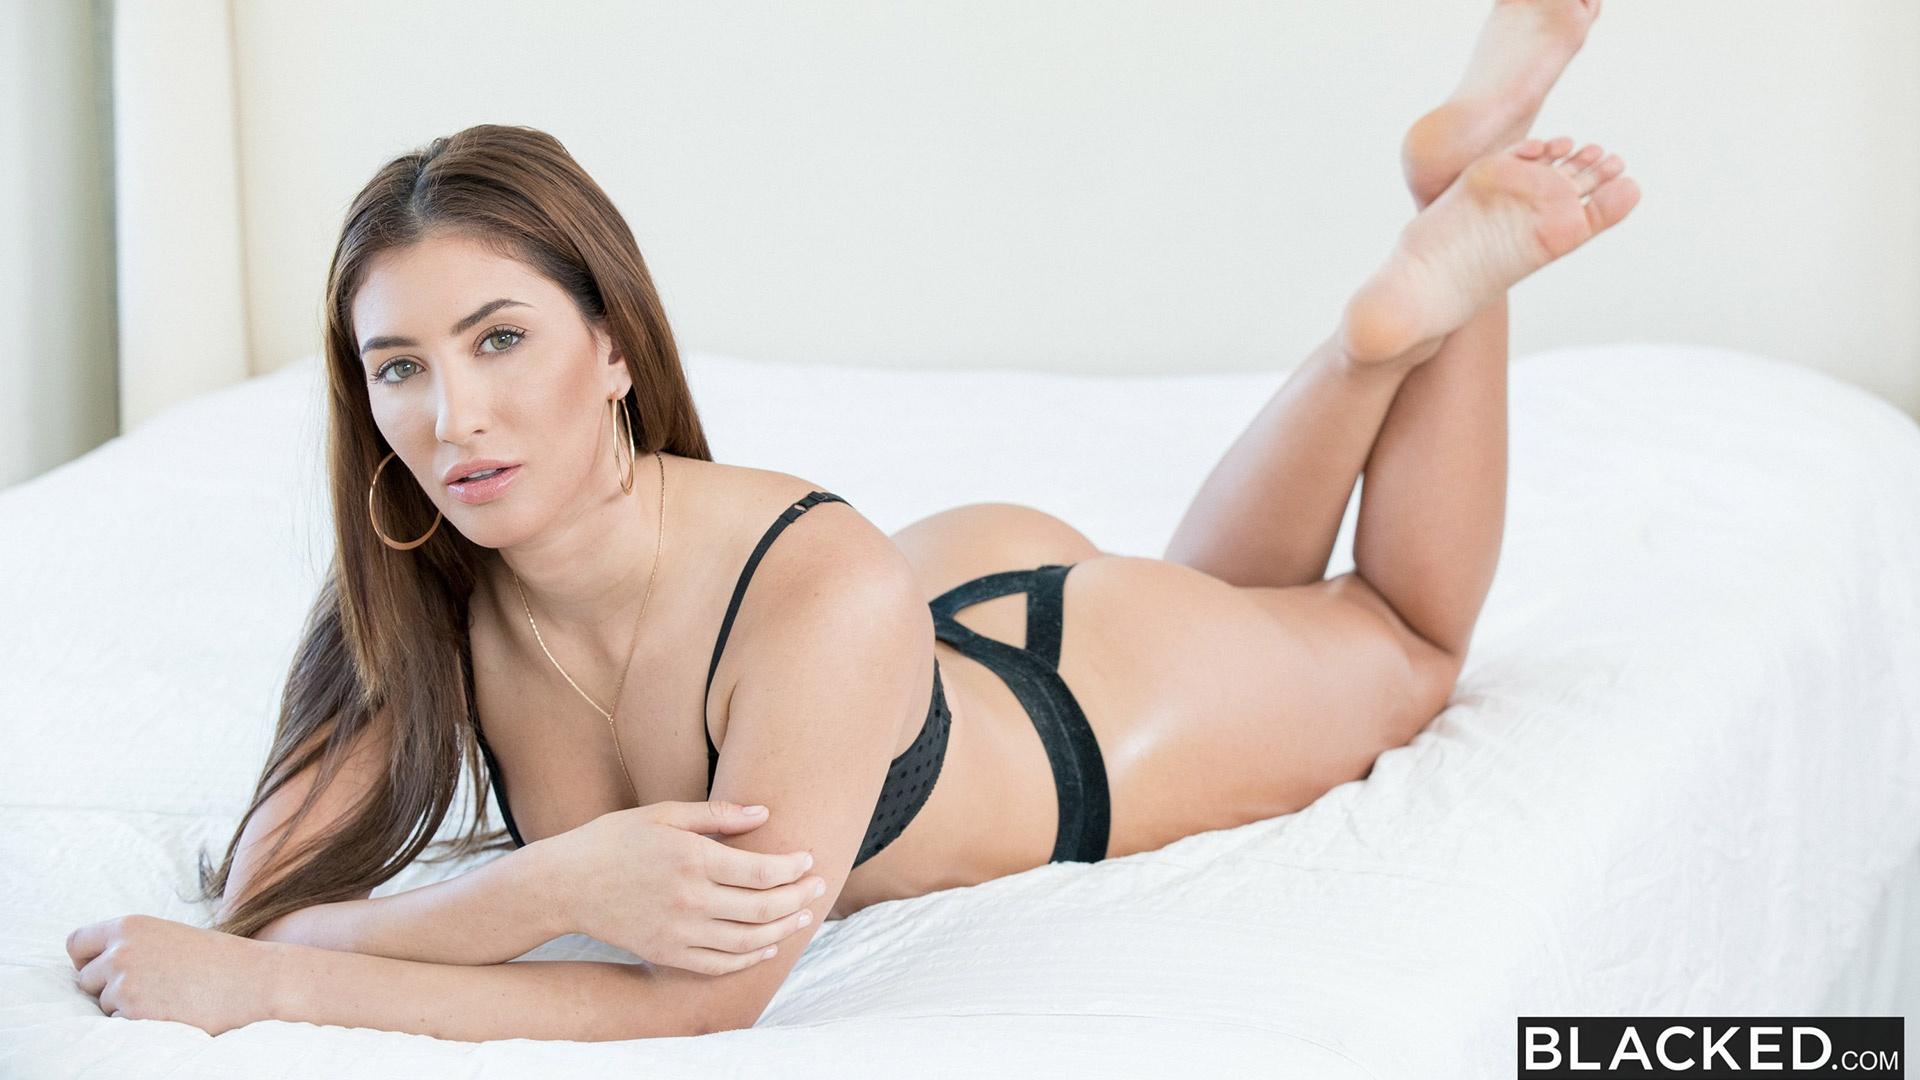 Davina Davis hot curves porn star in sexy lingerie for